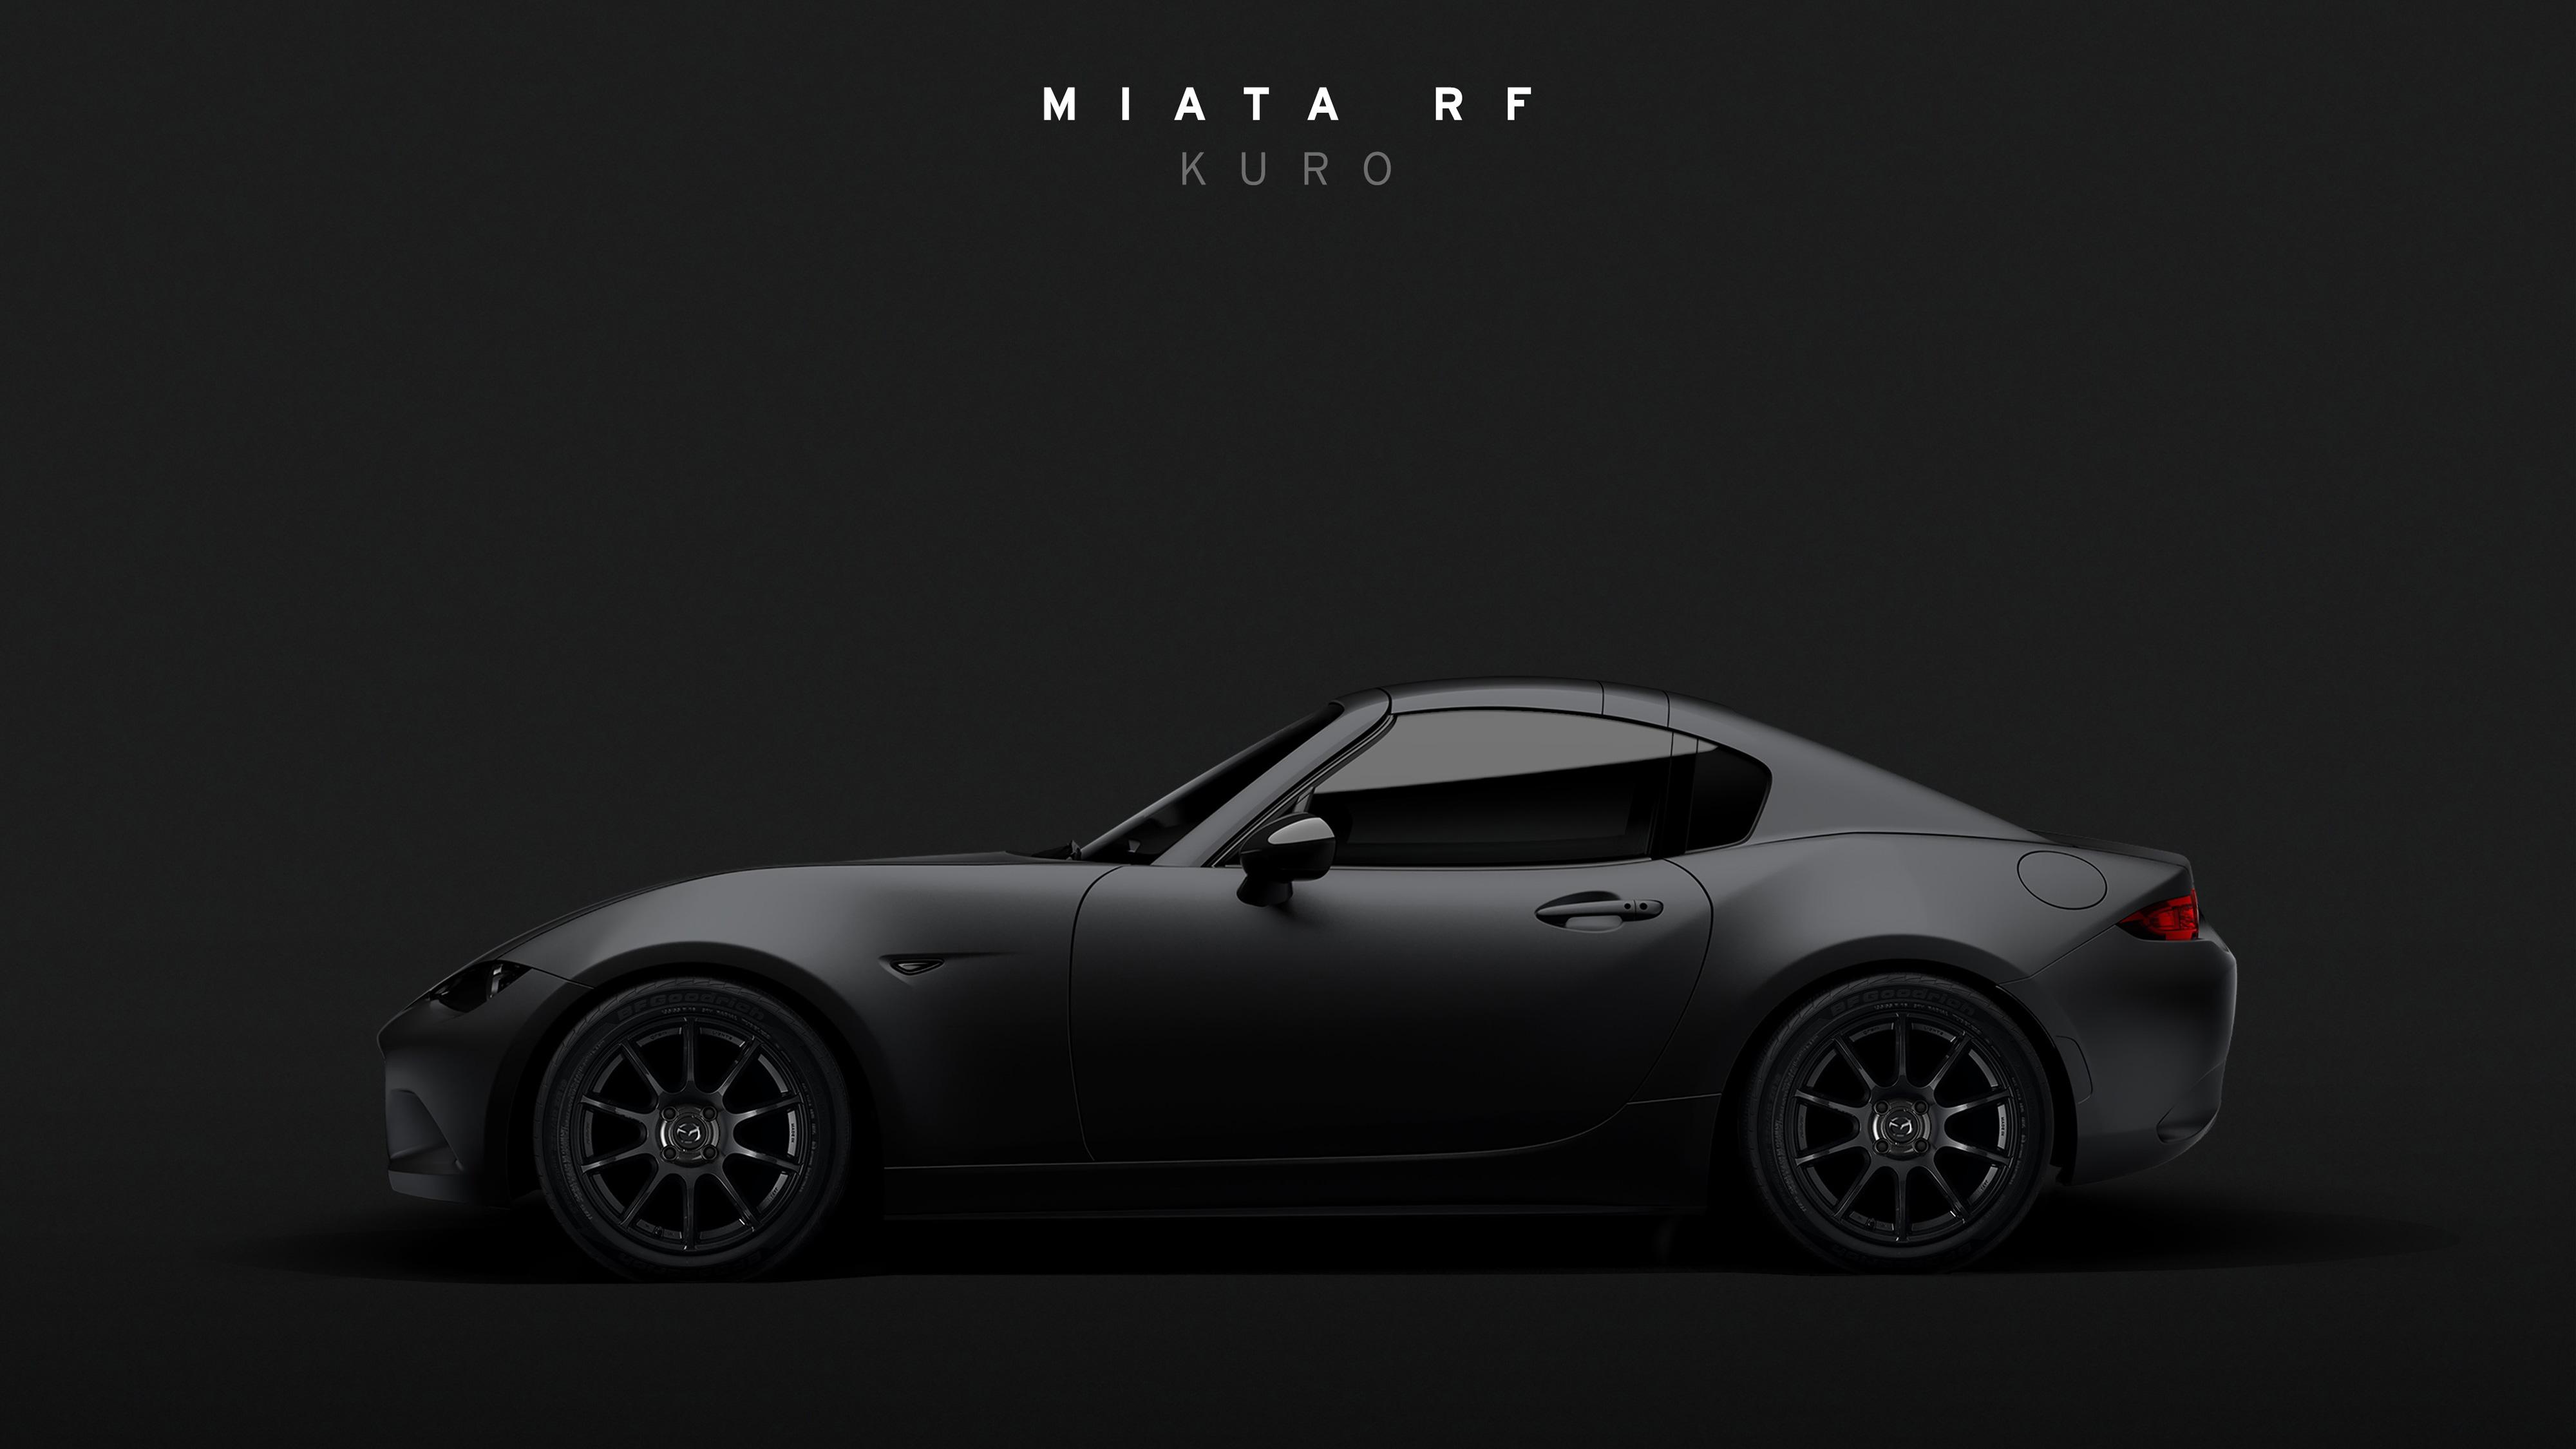 Iphone 6 Car Wallpaper Bmw 2017 Mazda Mx 5 Miata Rf Roadster Wallpaper Hd Car